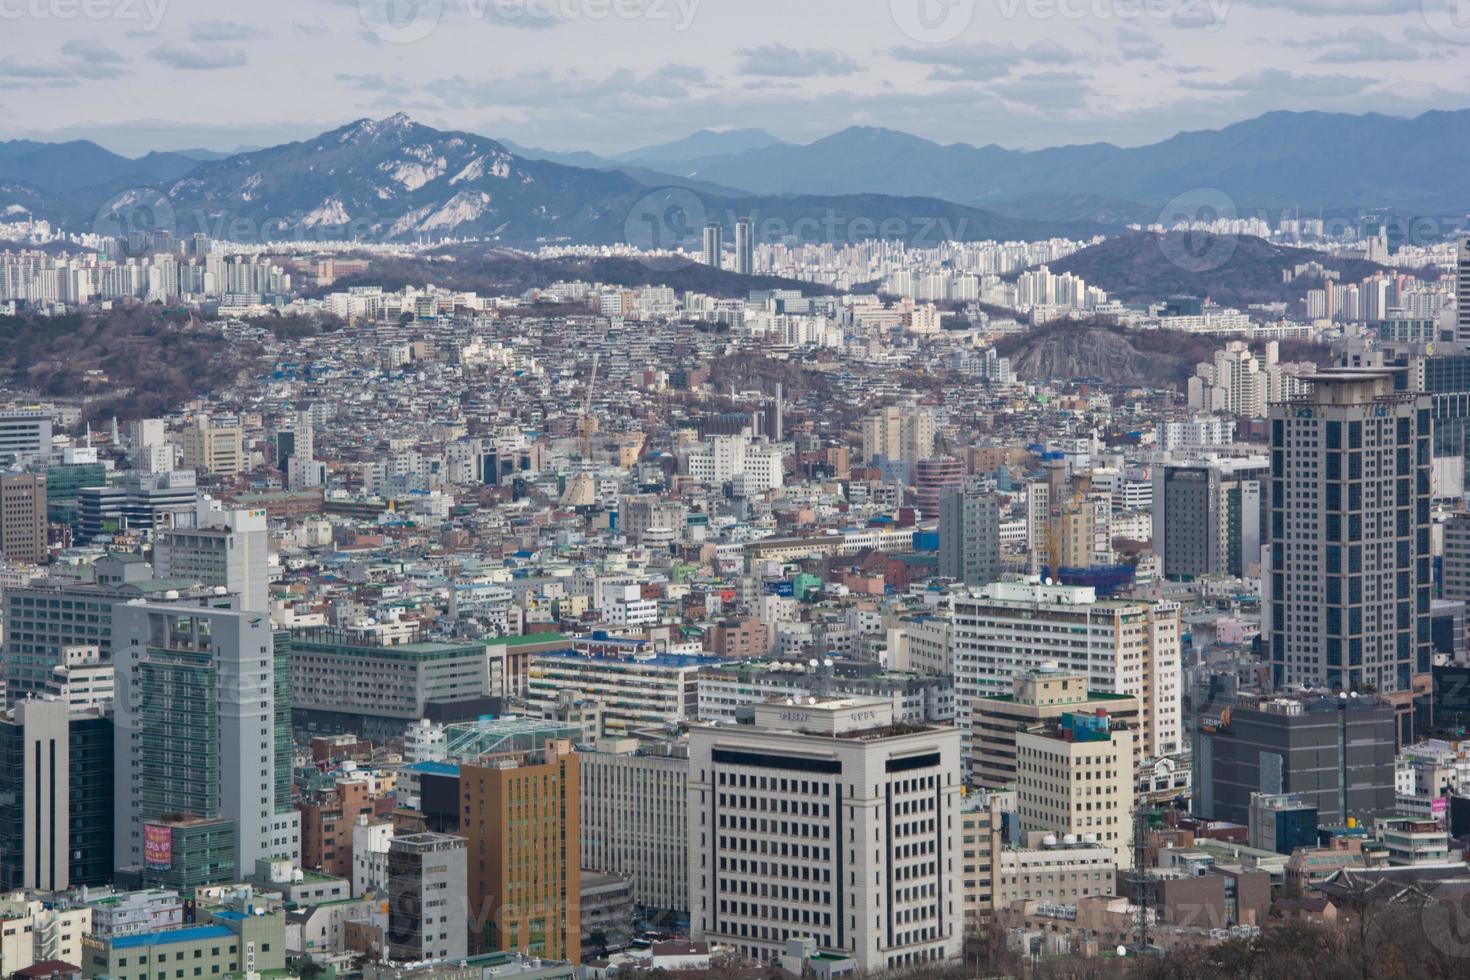 Seoul Stadtbild Luftaufnahme foto